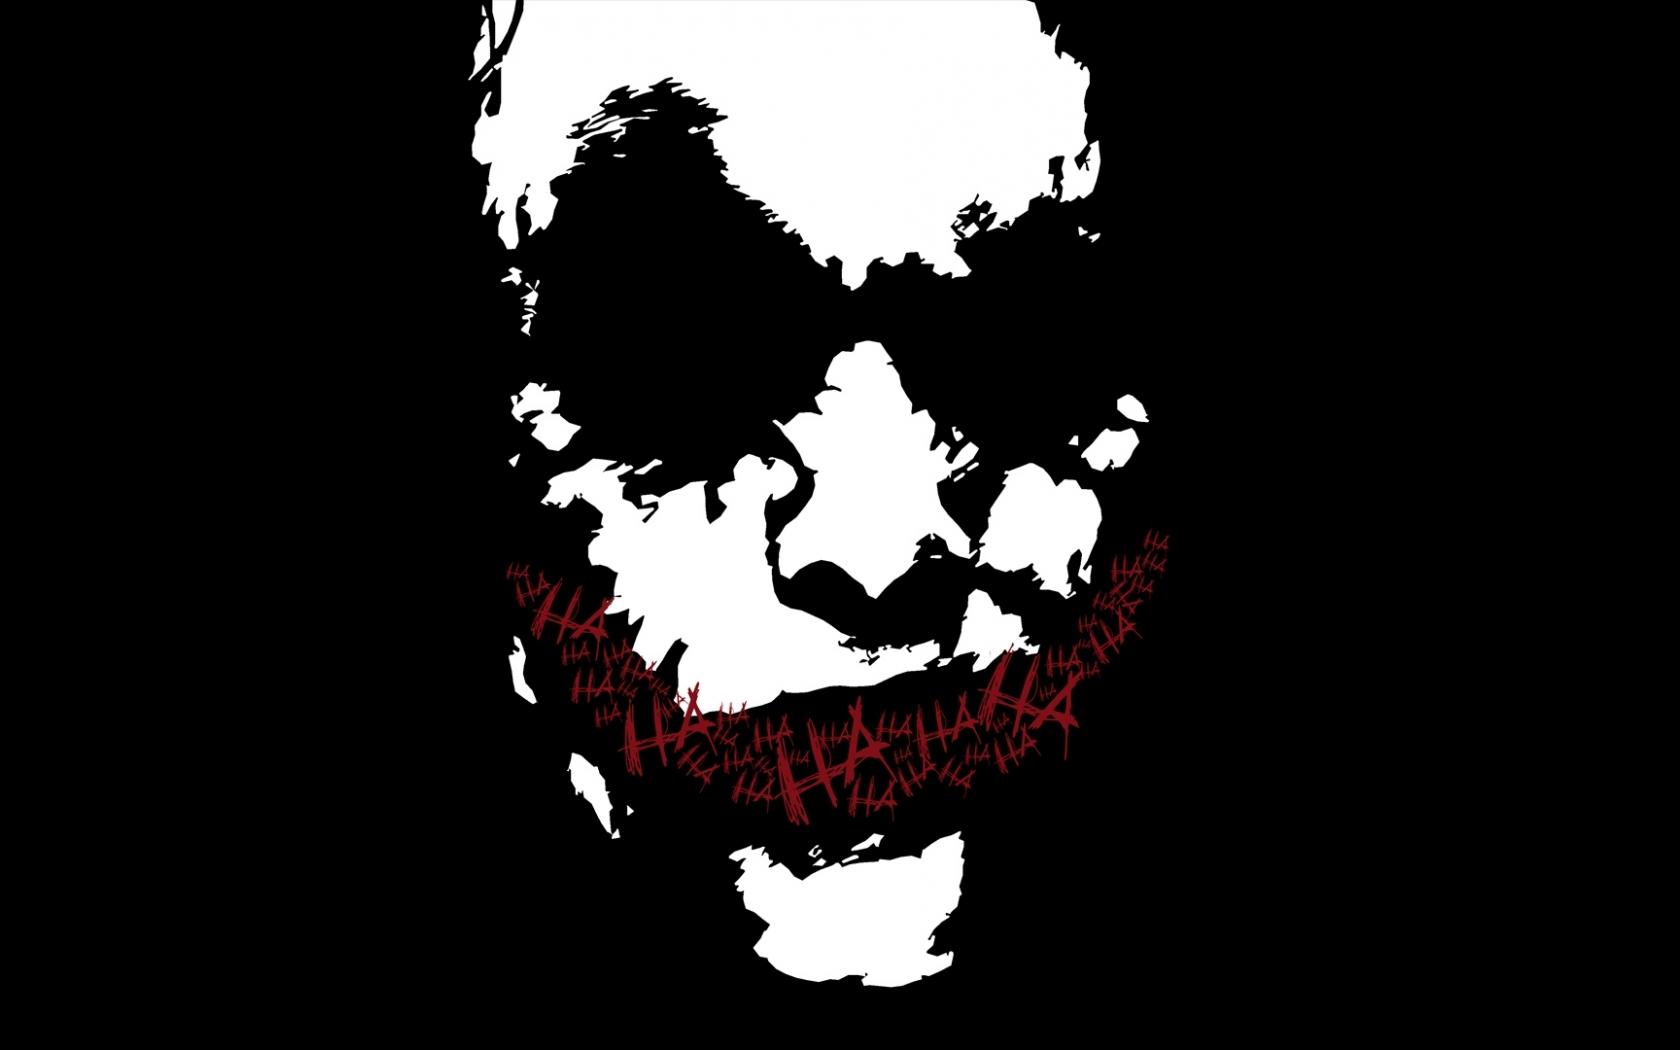 Heath Ledger as Joker vector smile wallpaper in Movies wallpapers 1680x1050